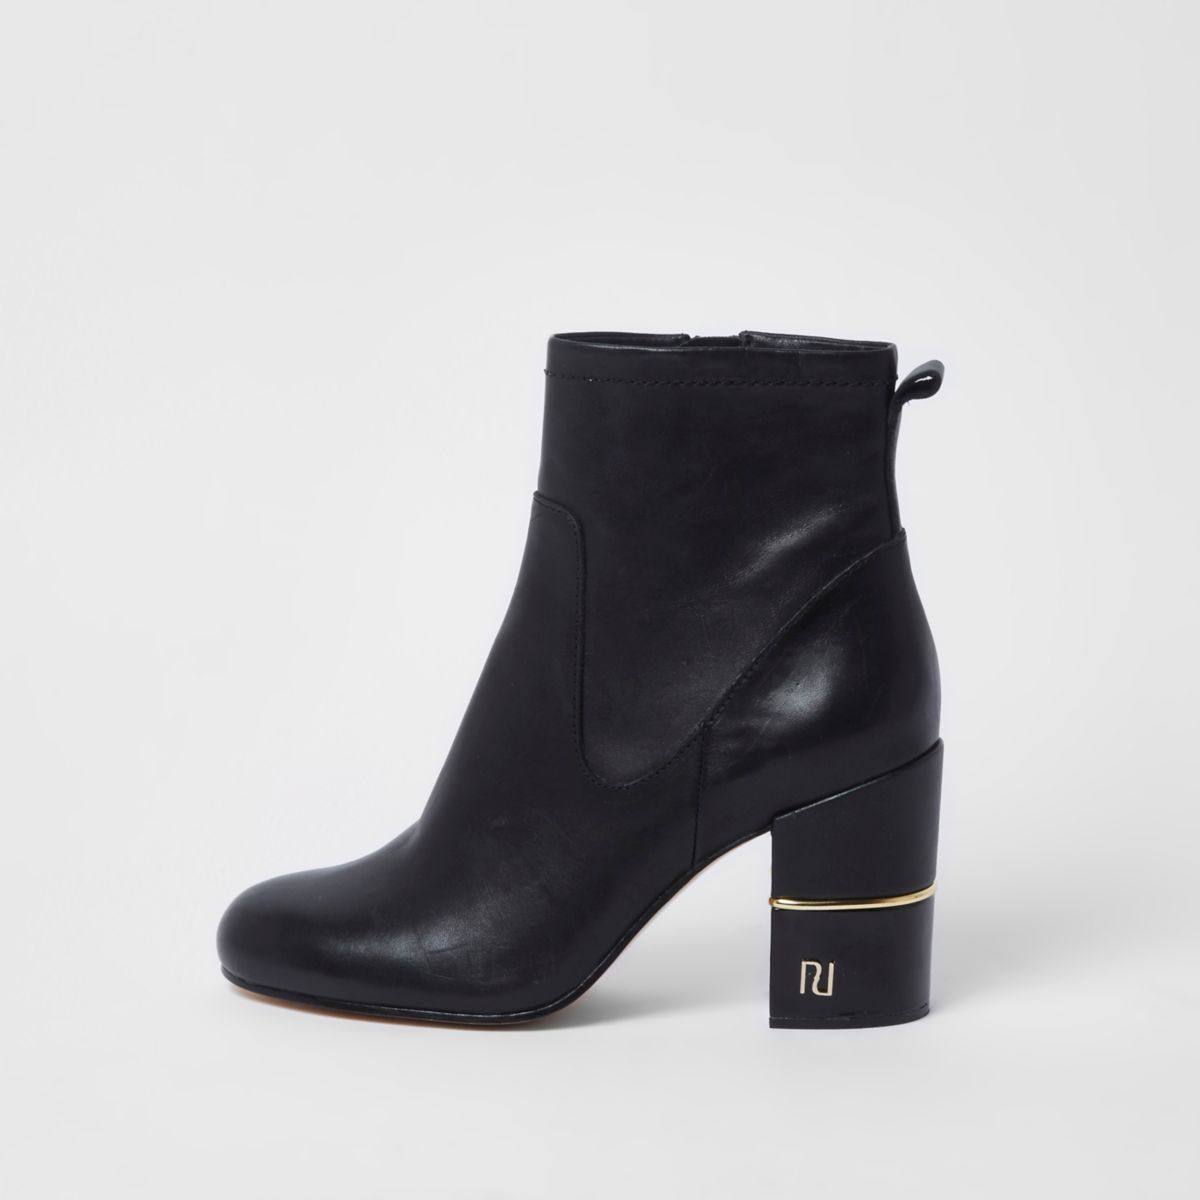 Zwarte enkellaarsjes met RI-logo en blokhak